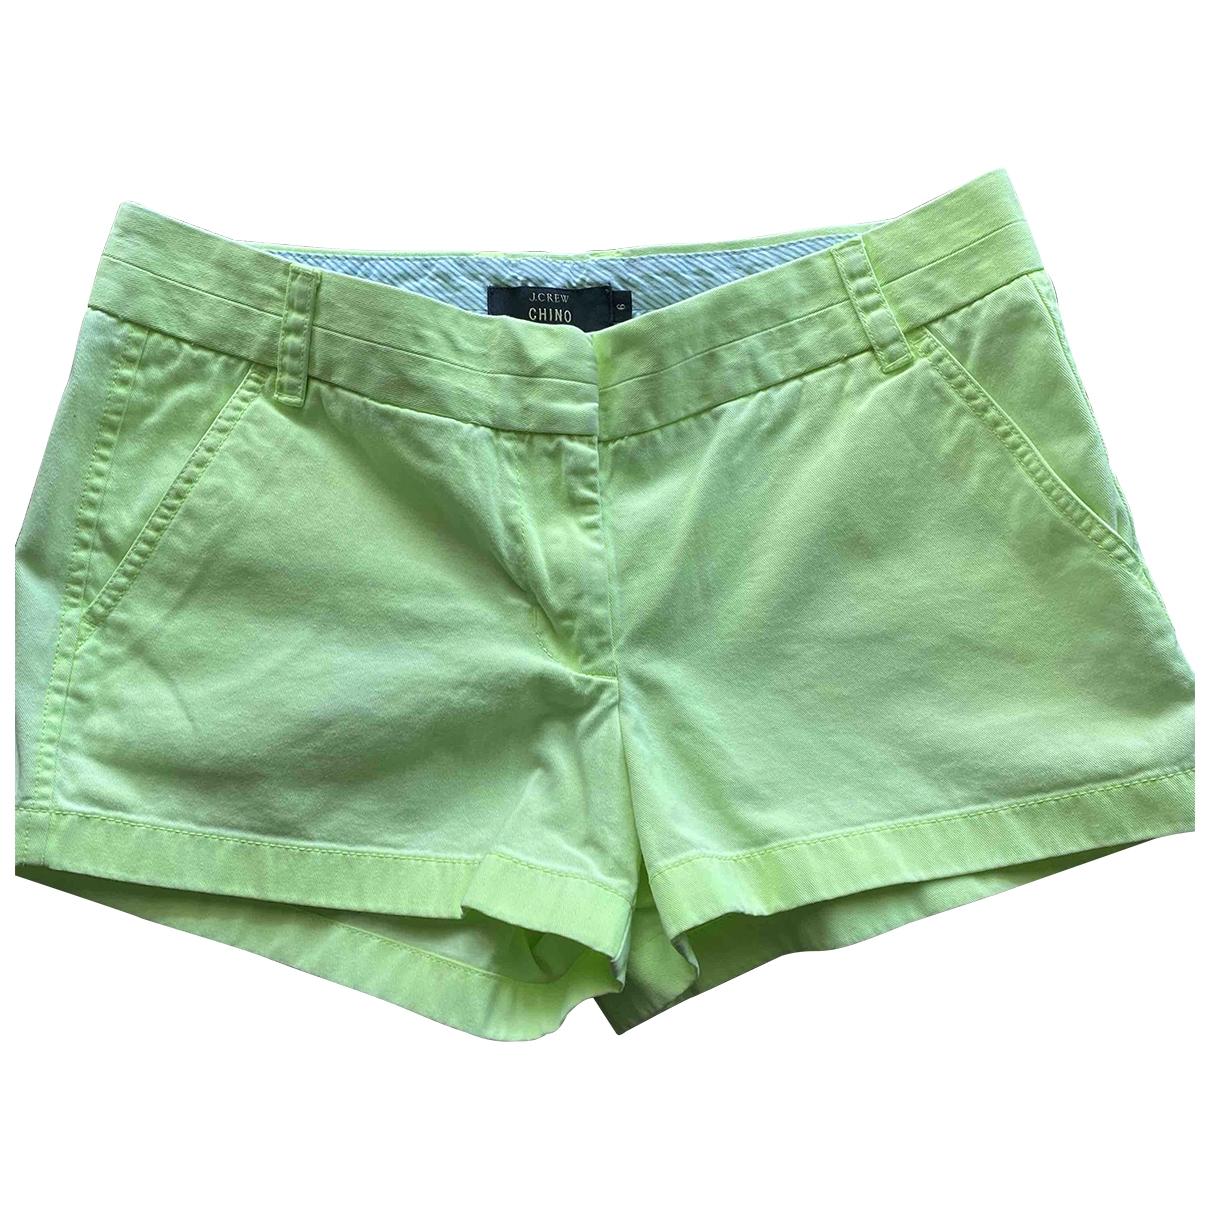 J.crew \N Shorts in  Gruen Baumwolle